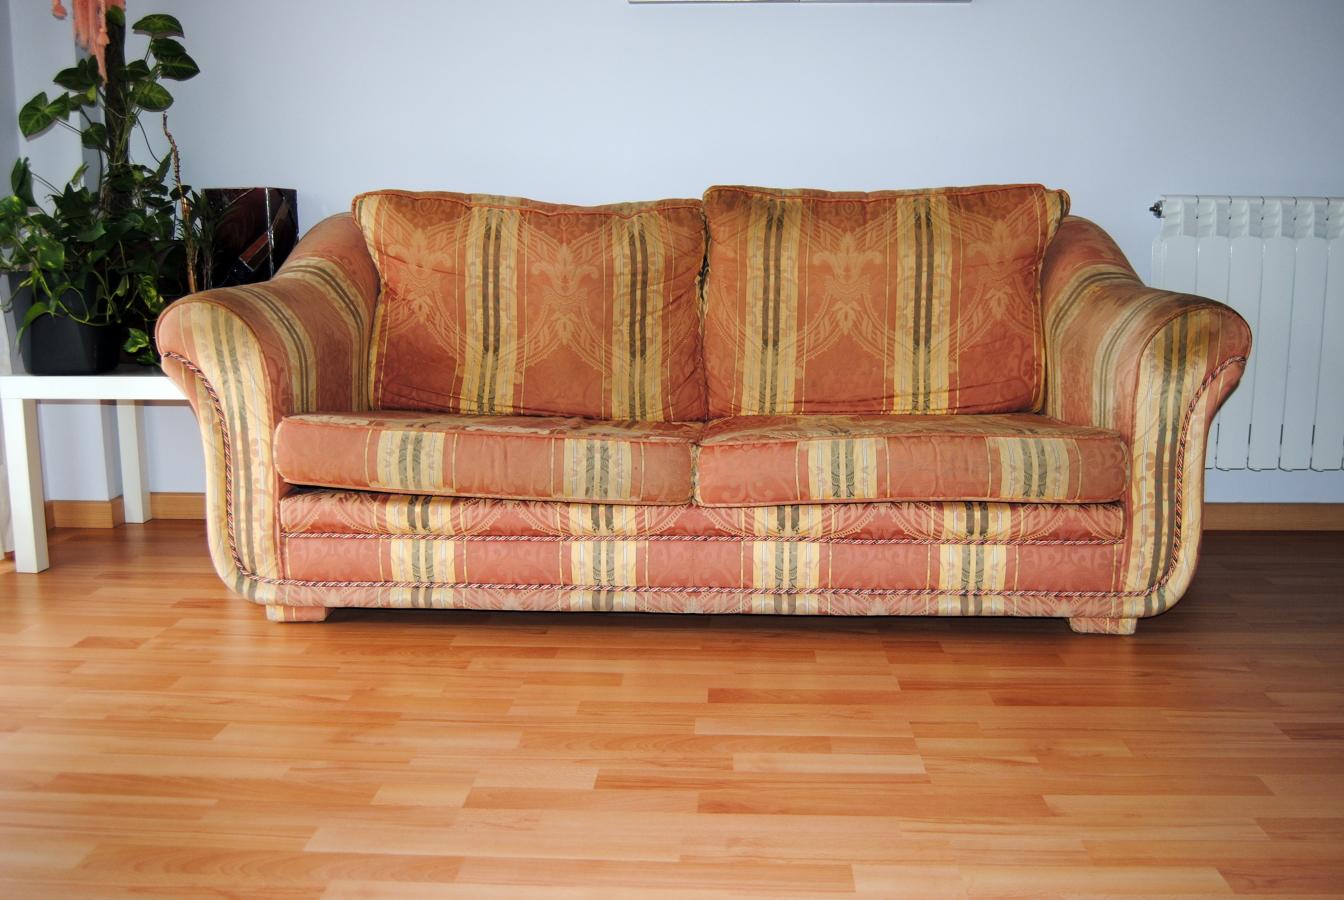 Tapizar sill n de 2 2 m x 1 m x 0 82 cm rivas - Tapizar sofas precios ...